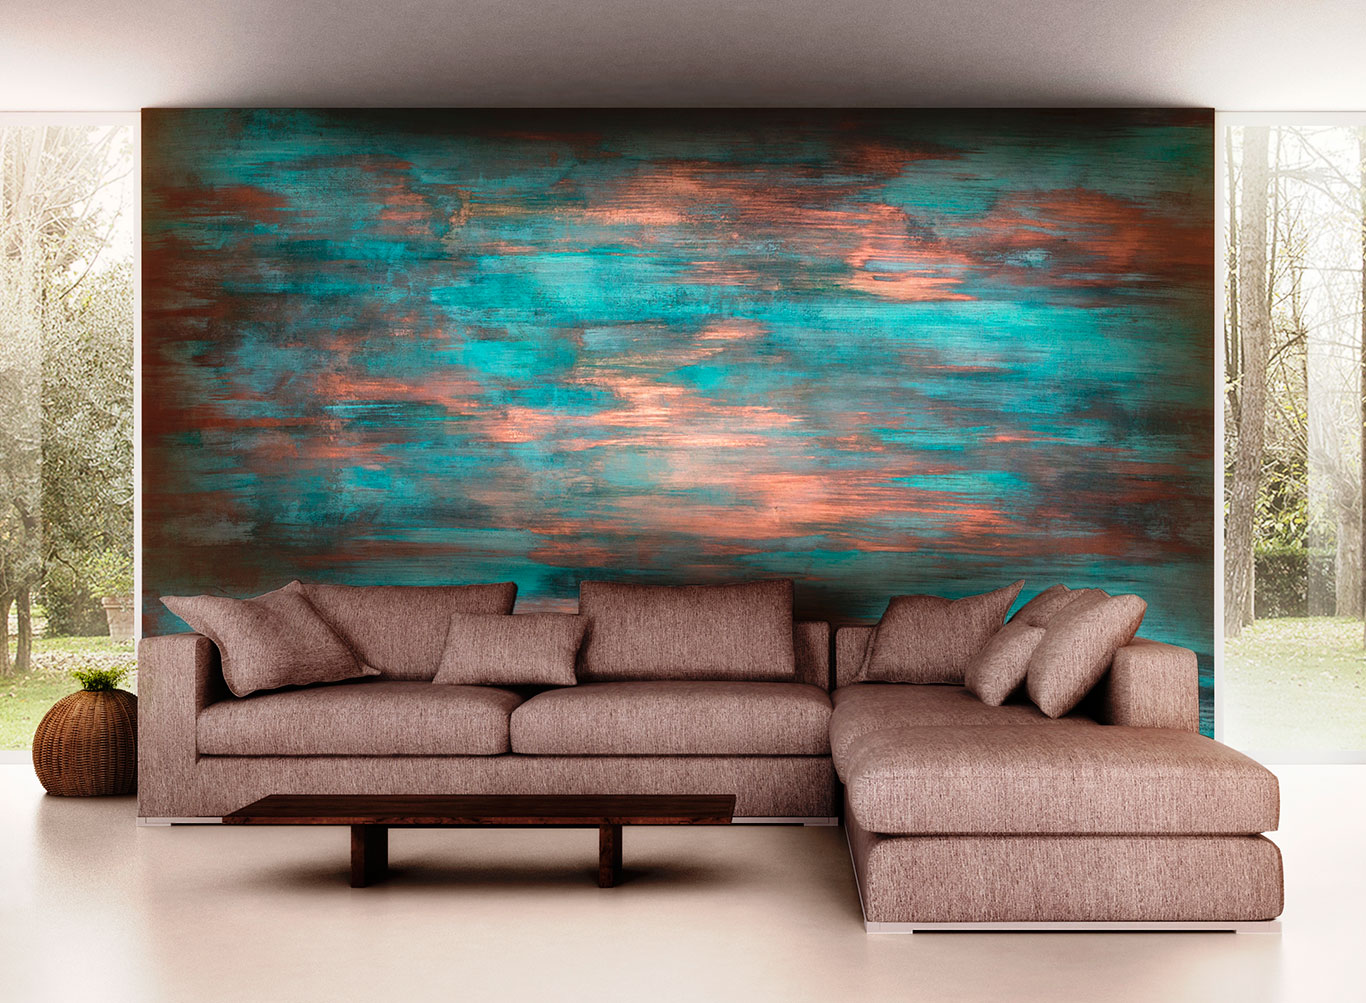 Cobre oxidado verderame novacolor - Pinturas decorativas en paredes ...